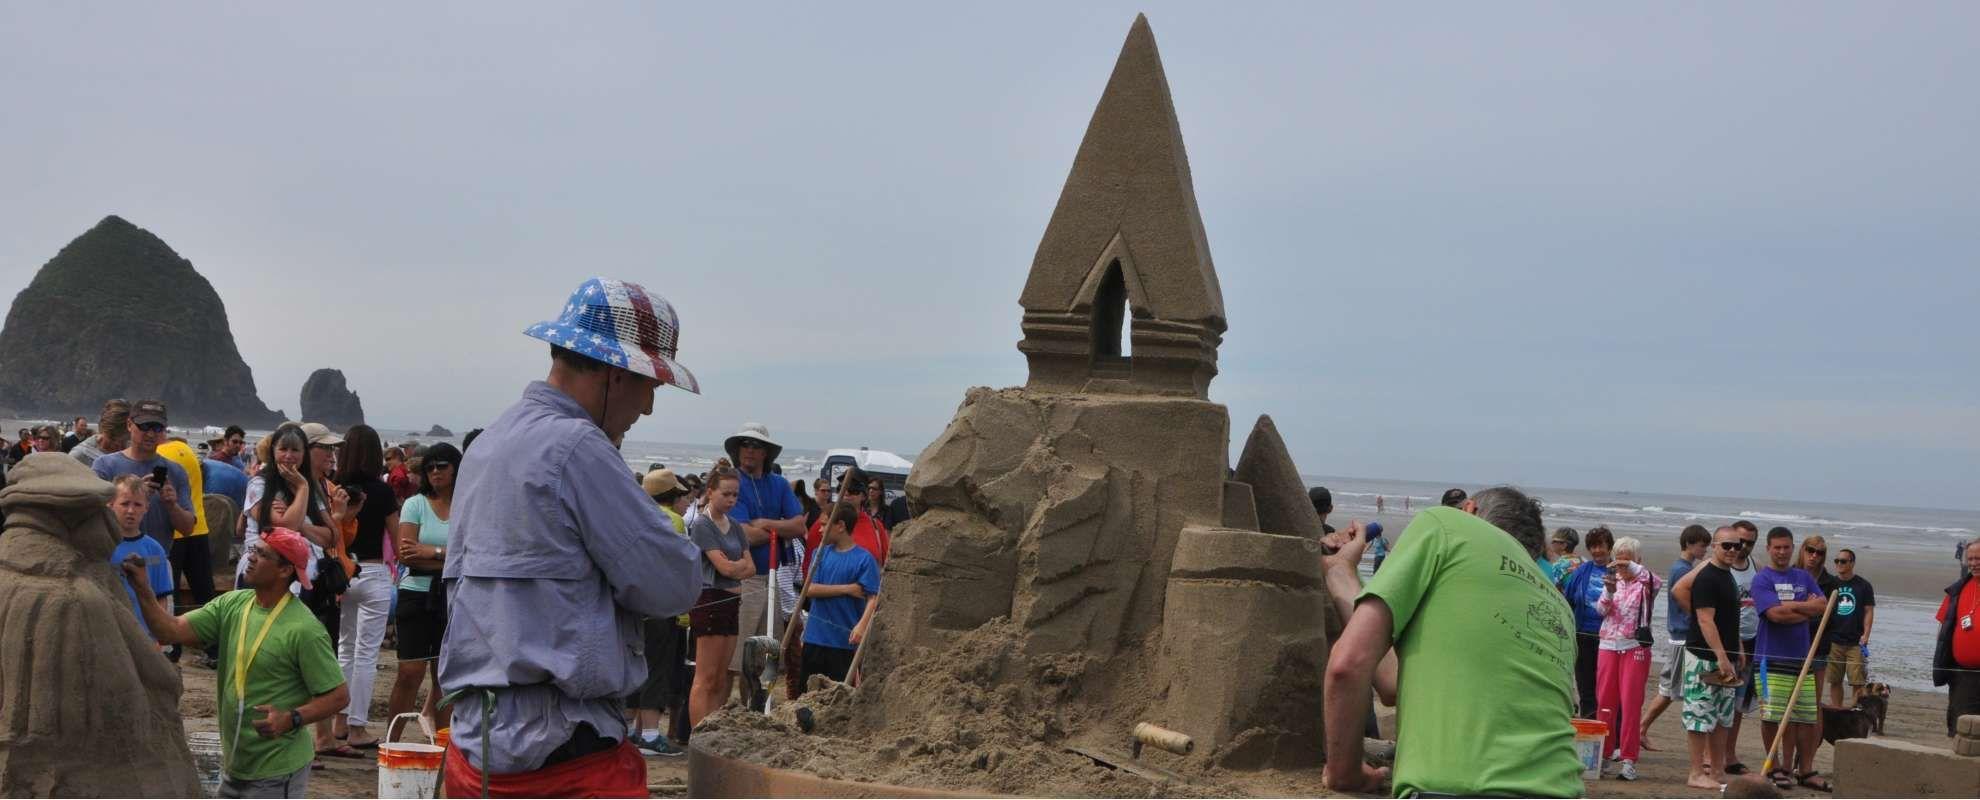 Cannon Beach Oregon Sandcastle Contest Travel